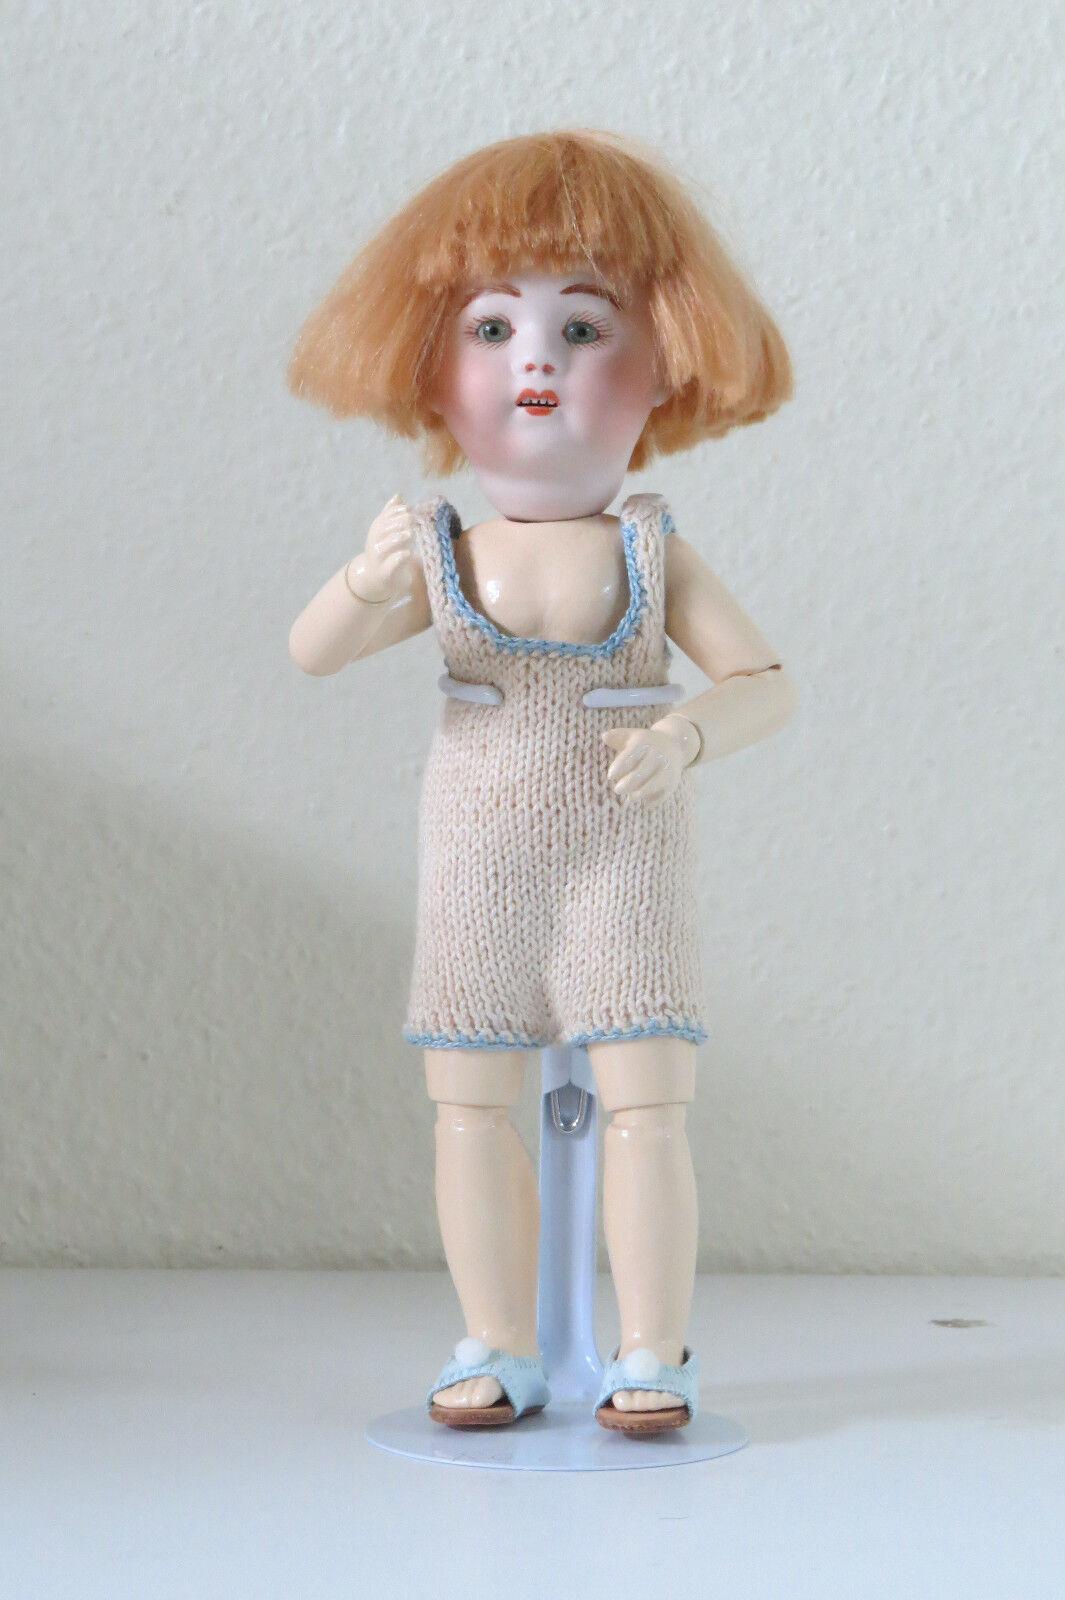 bluette  collection    Loulotte  Réf    RO62    Creation as antique bambola  risposte rapide